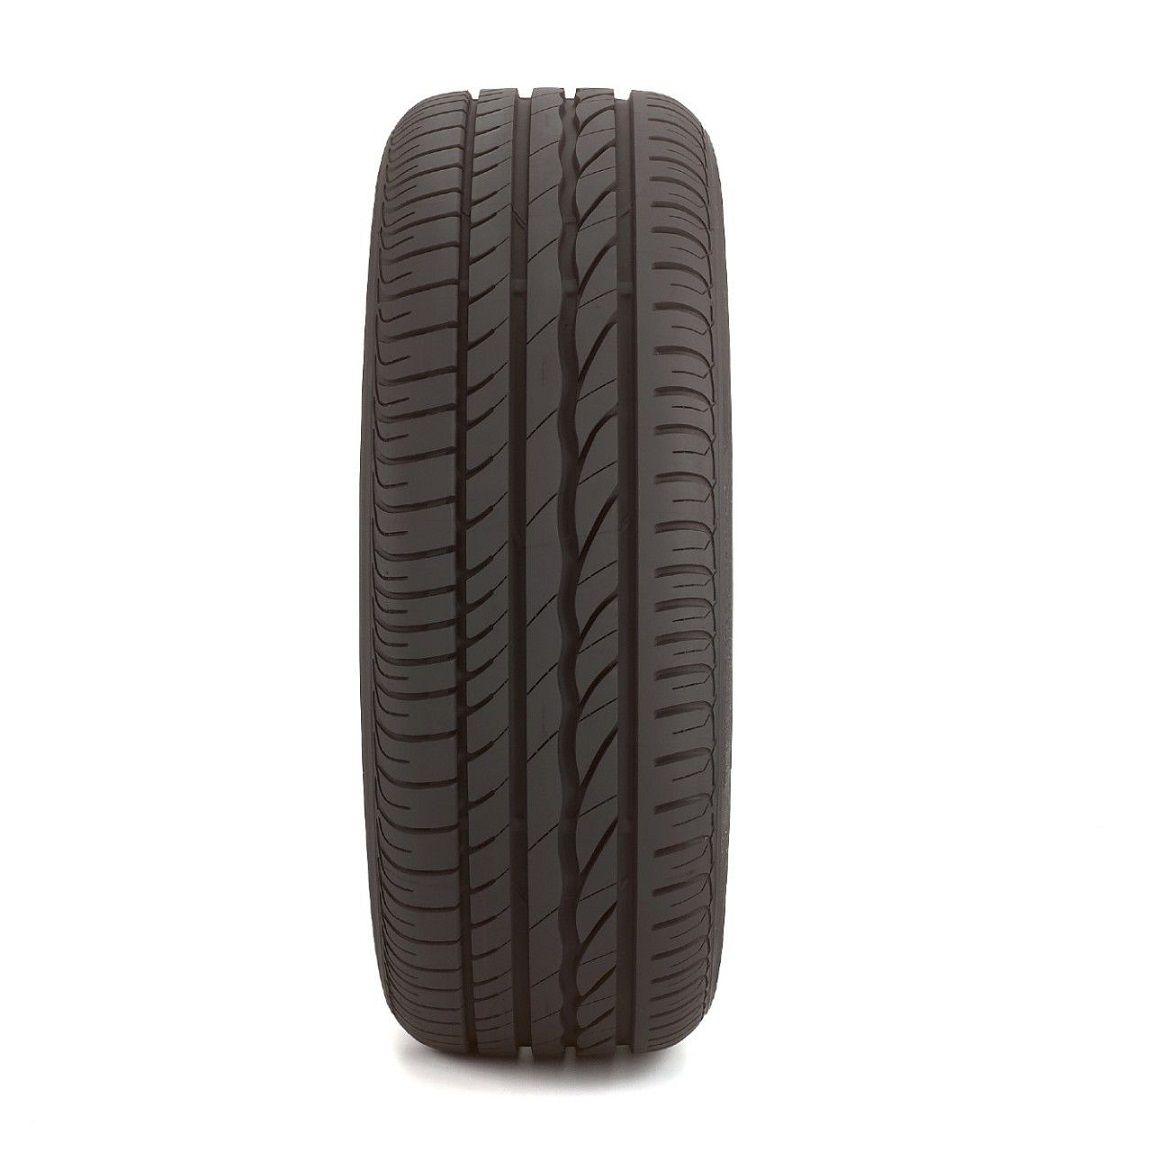 Pneu 245/45 R 18 - Turanza Er300 Rft 96y Bridgestone